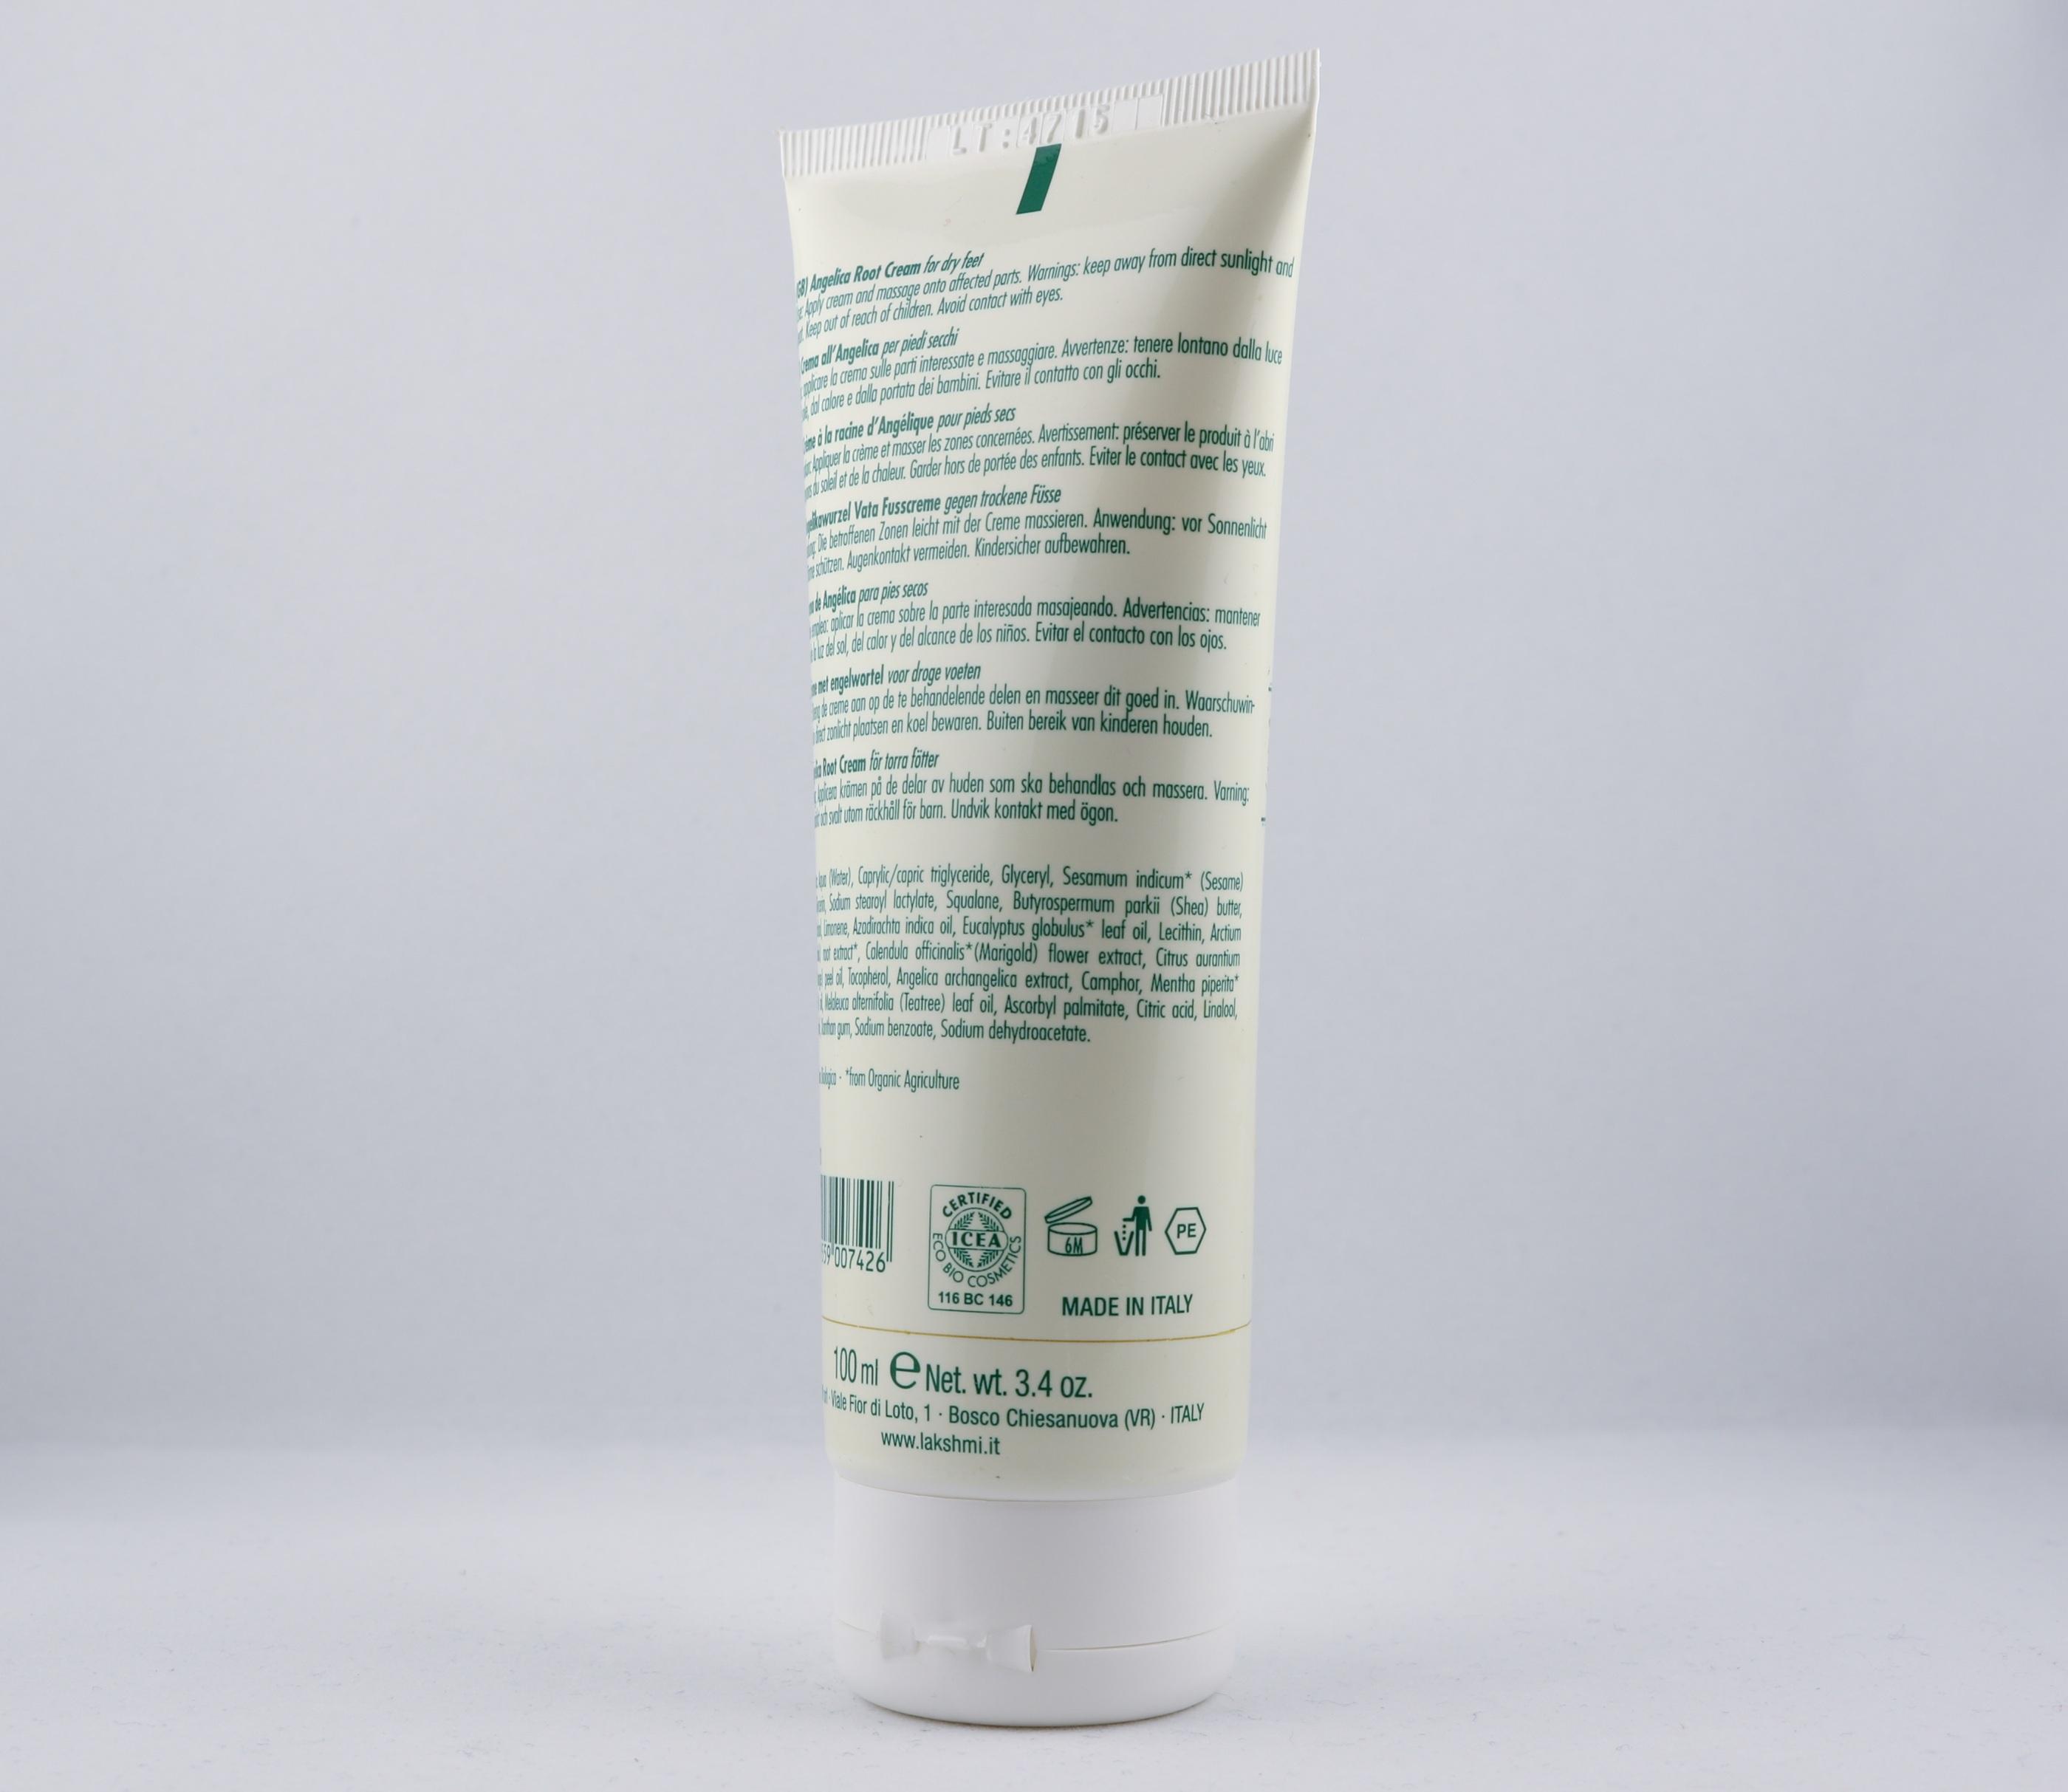 Vata Angelcia Root Cream hudvårdsprodukt hudvårdstyp alternativ hälsa wellness ayurveda Lakshmi